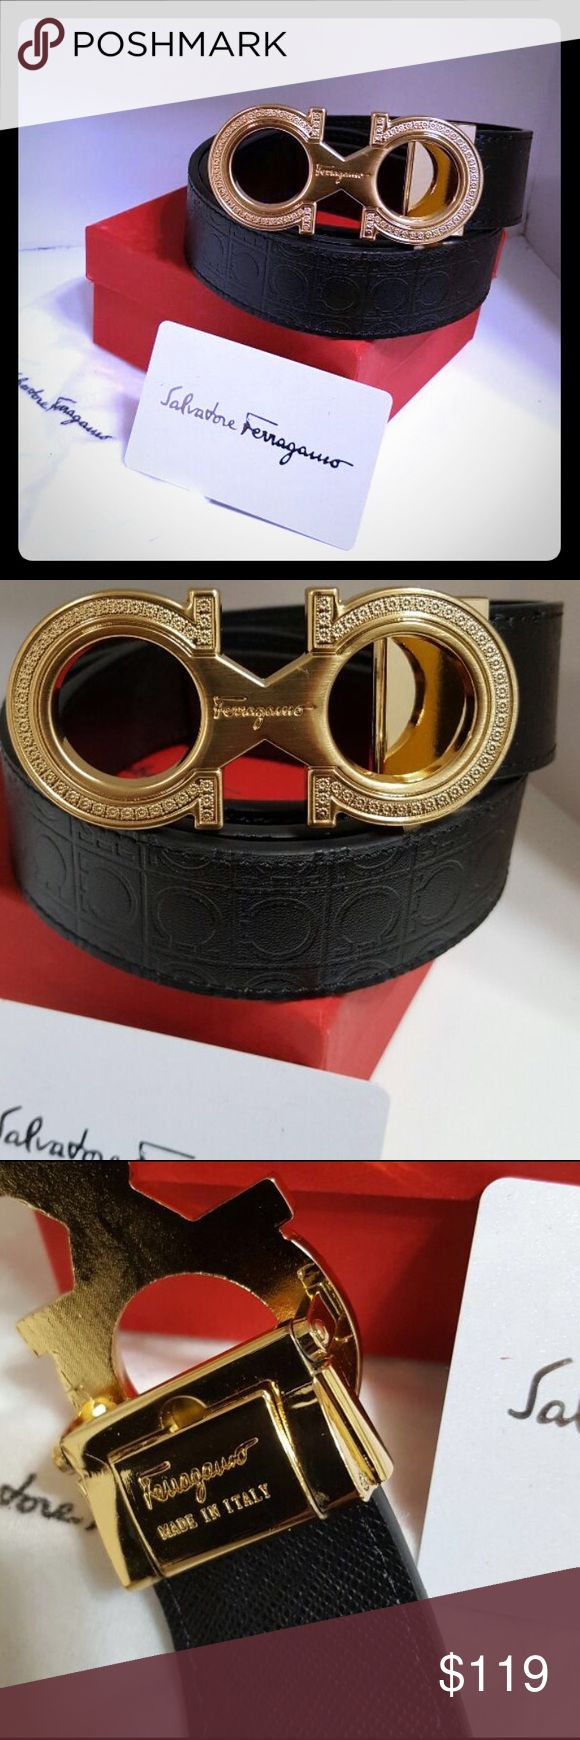 Mens S Ferragamo Belt 115/46 Sharp Black and Gold Ferragamo Belt, Card, Boz and Dust Bag Included Salvatore Ferragamo Accessories Belts